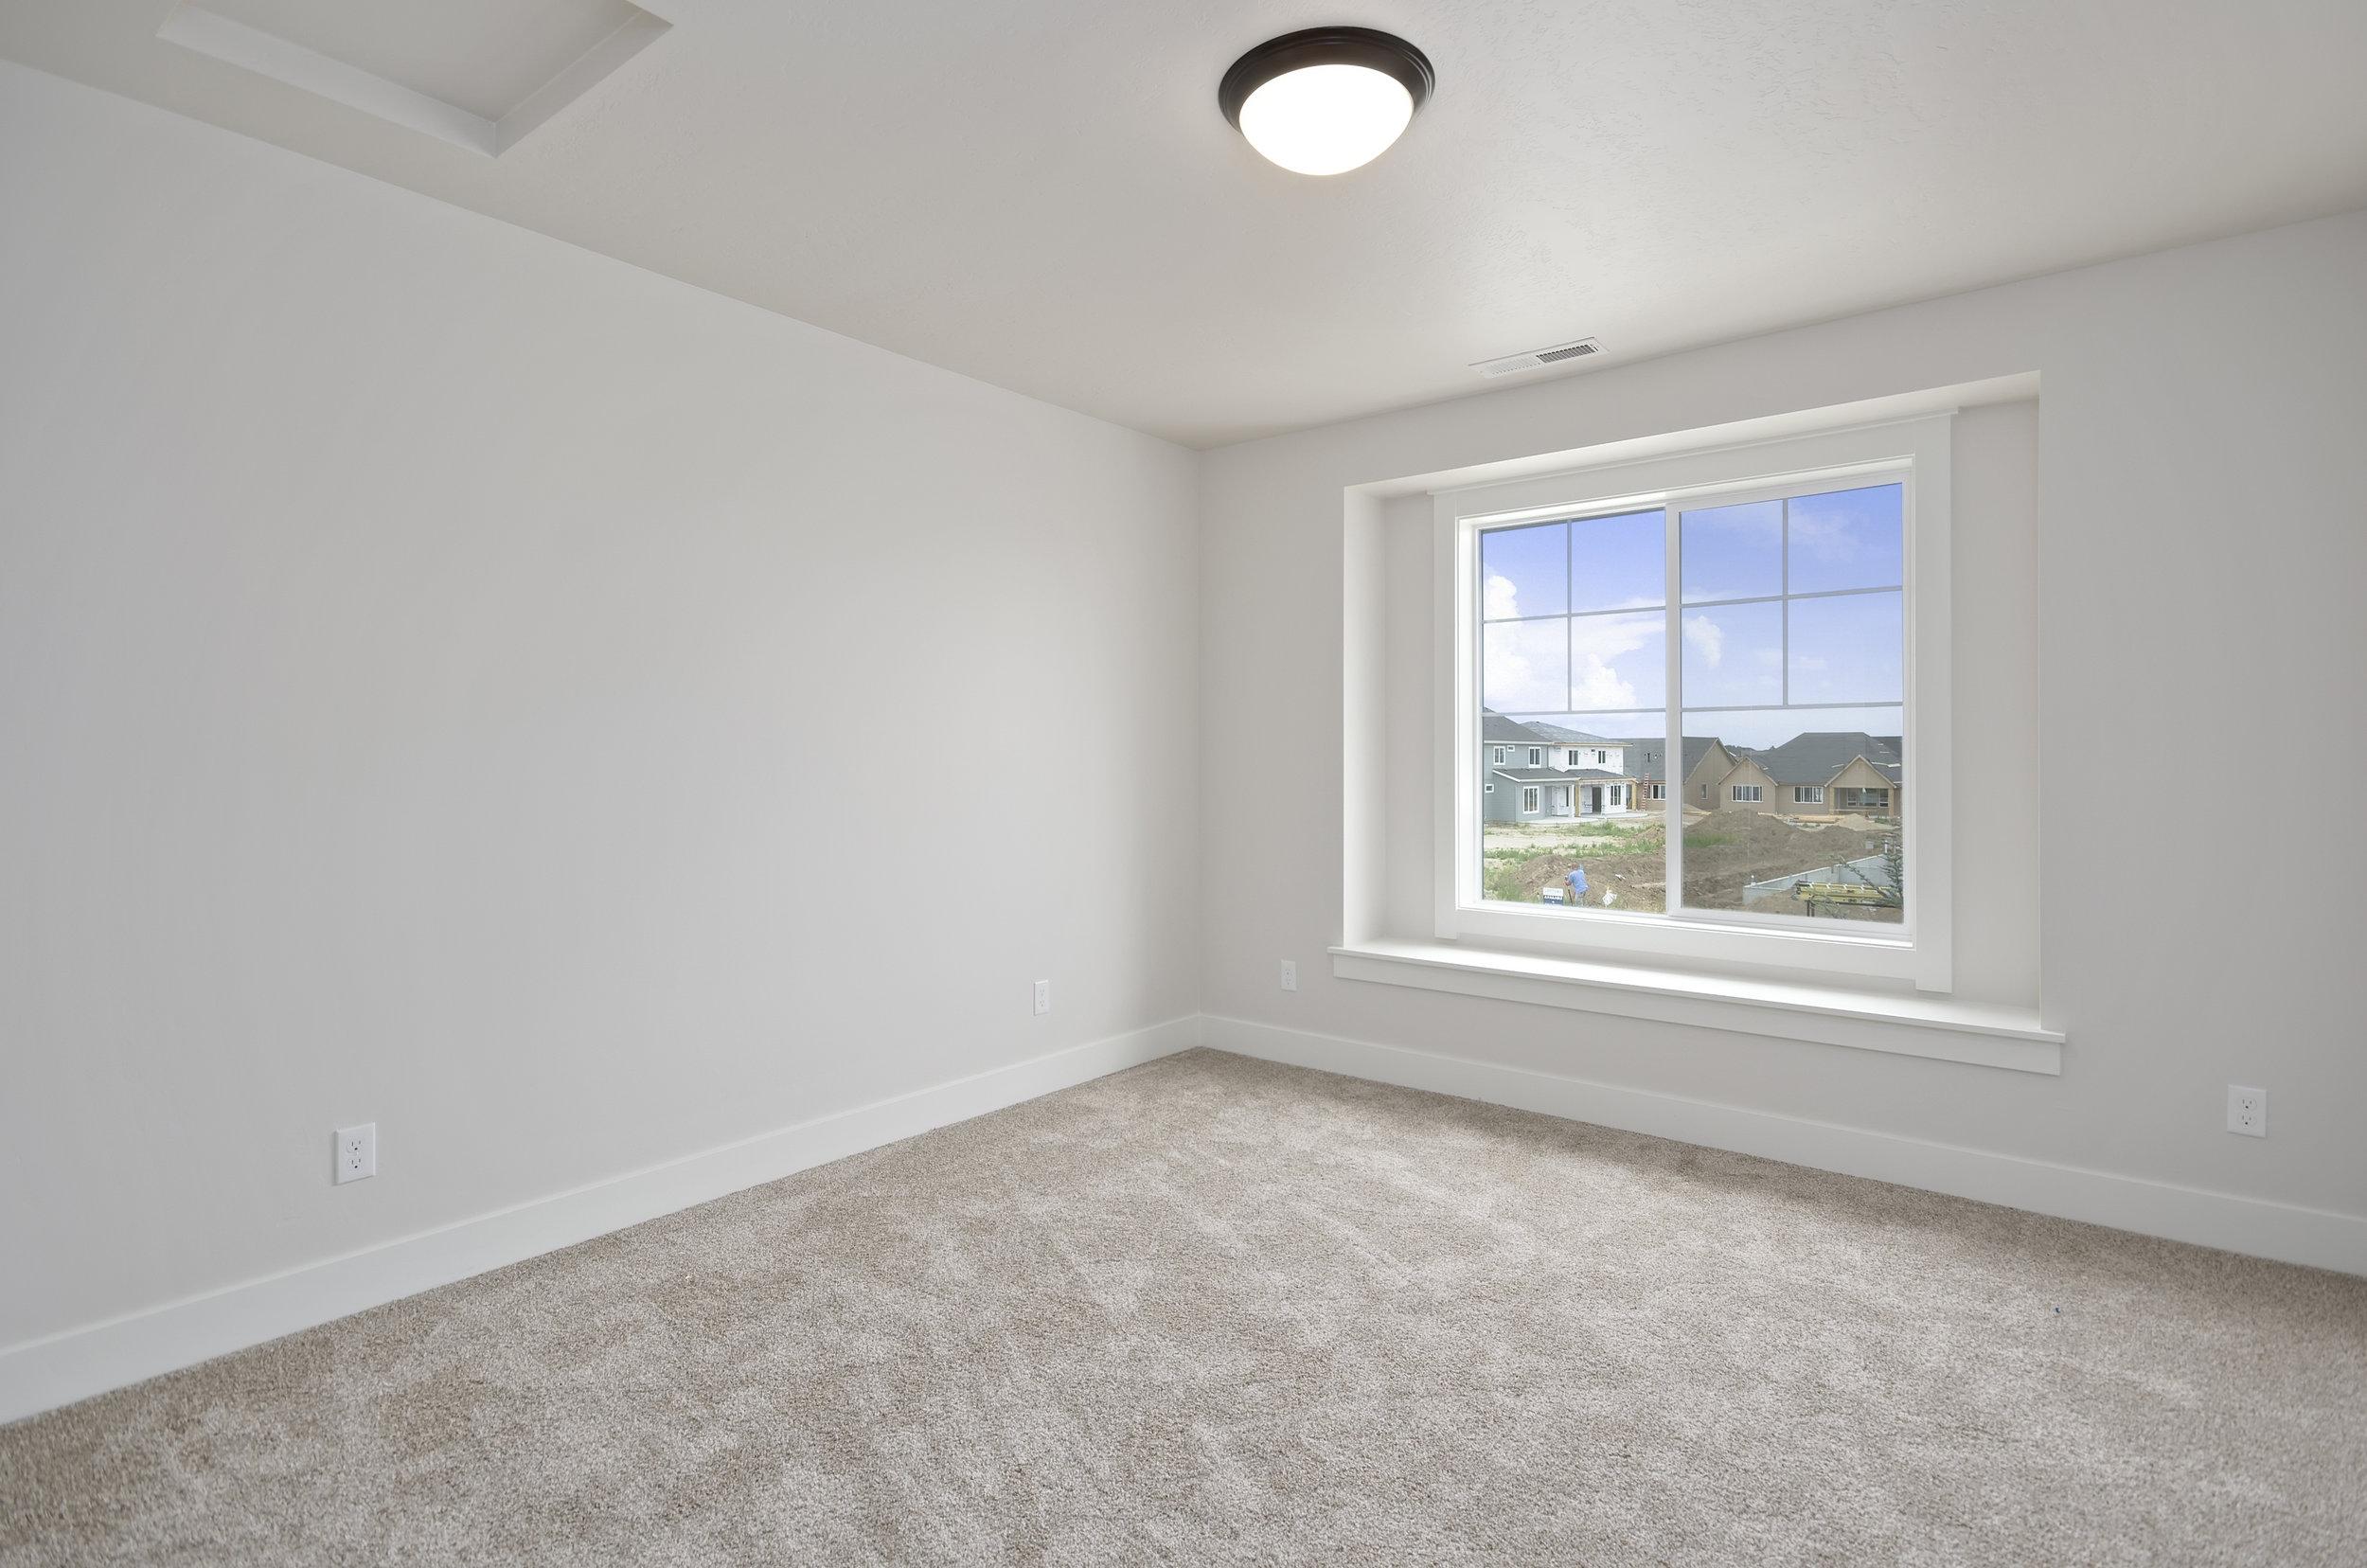 33-Bedroom.jpg